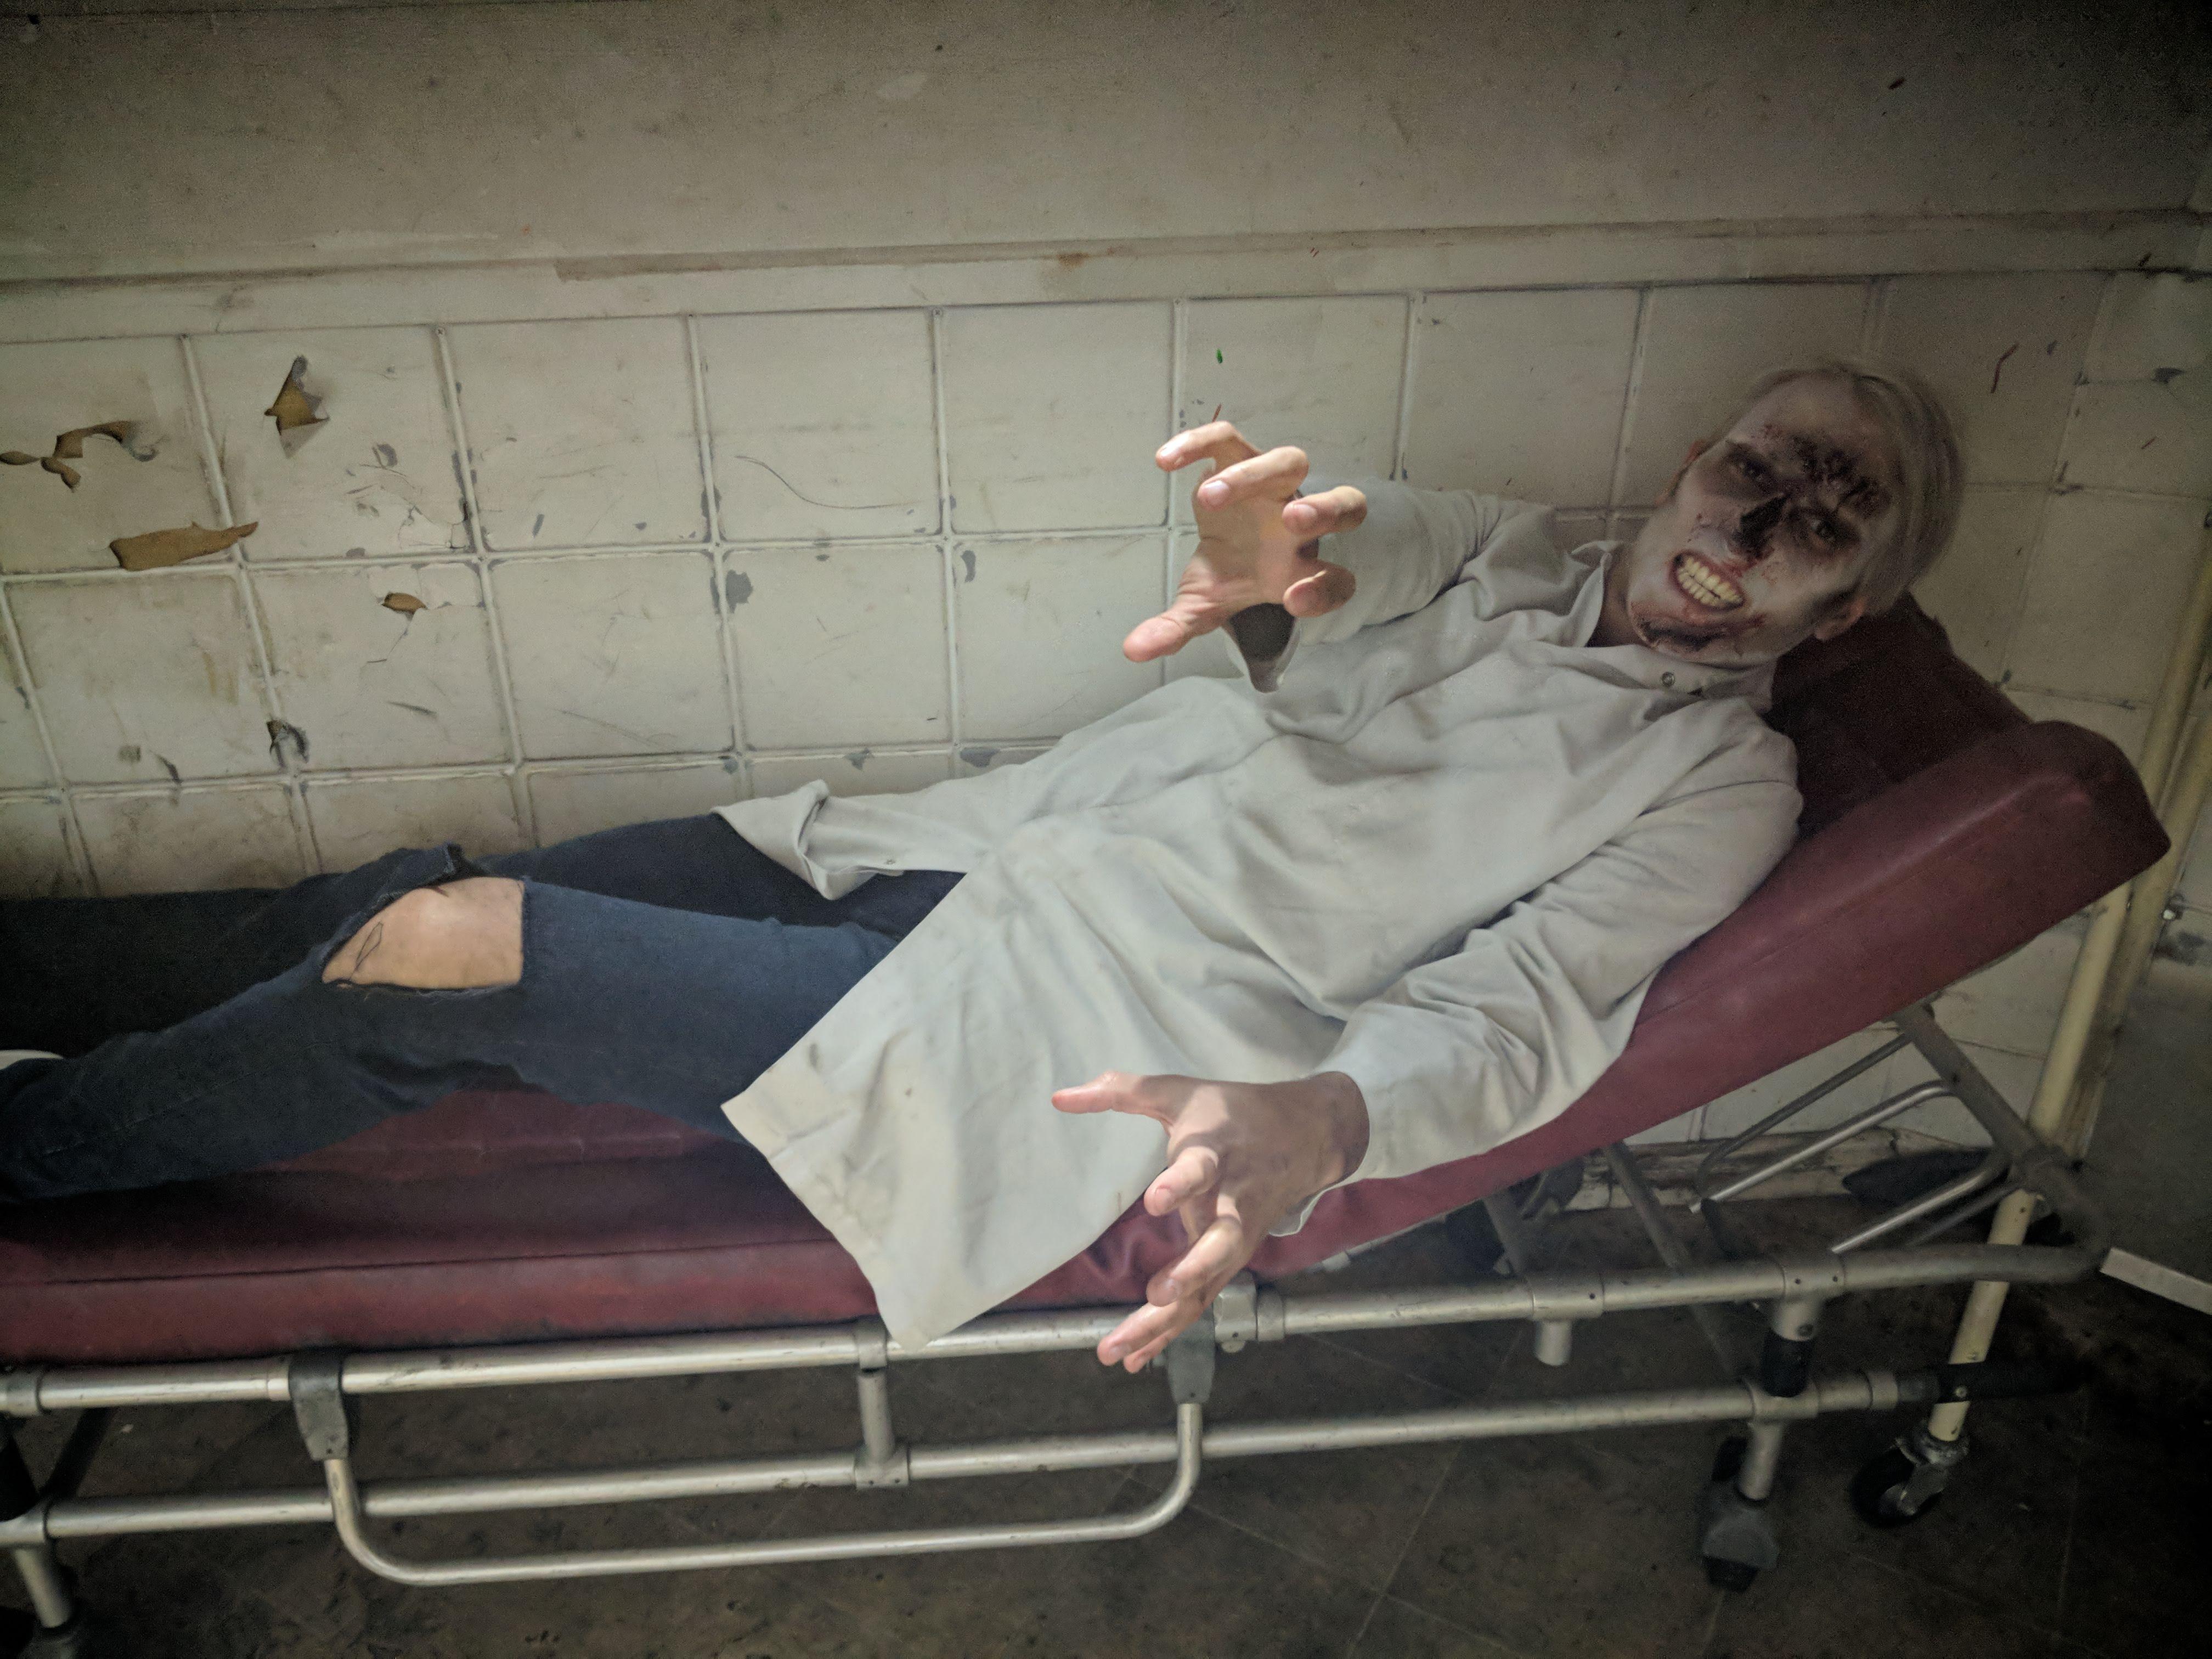 London Tombs - Steve zombie